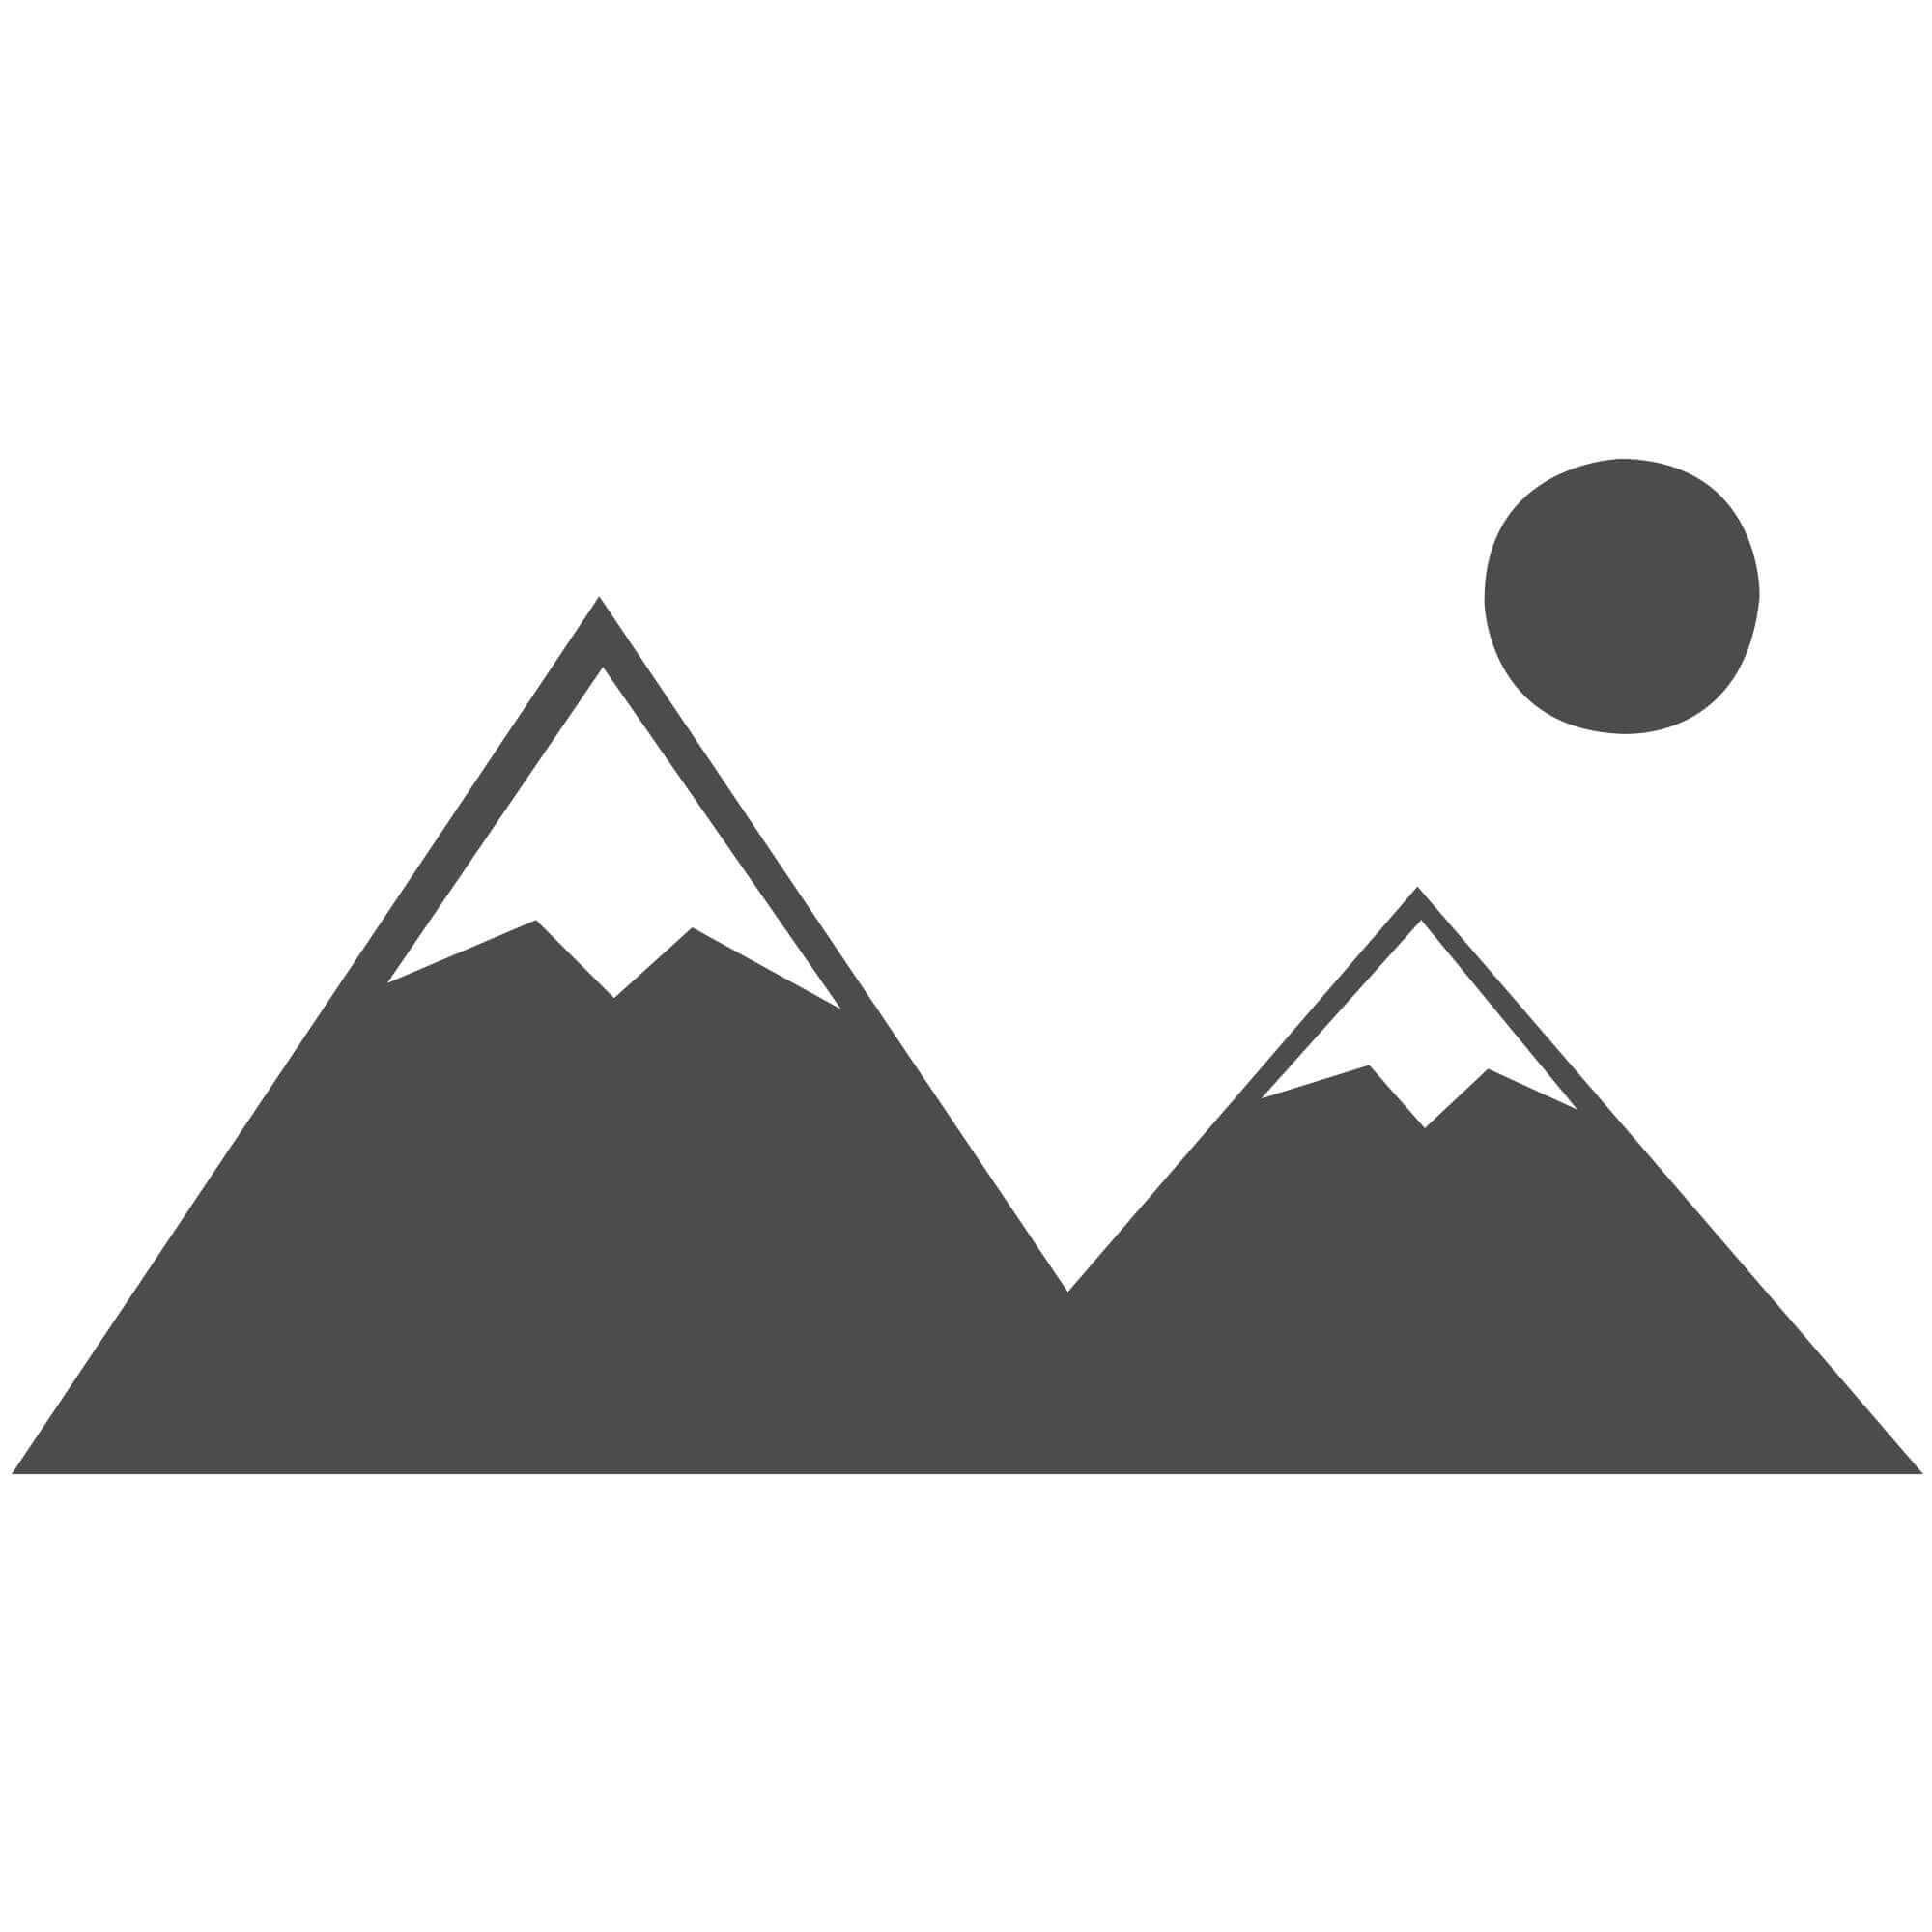 Persian Shiraz Tribal Wool Rug - 168 x 250 cm